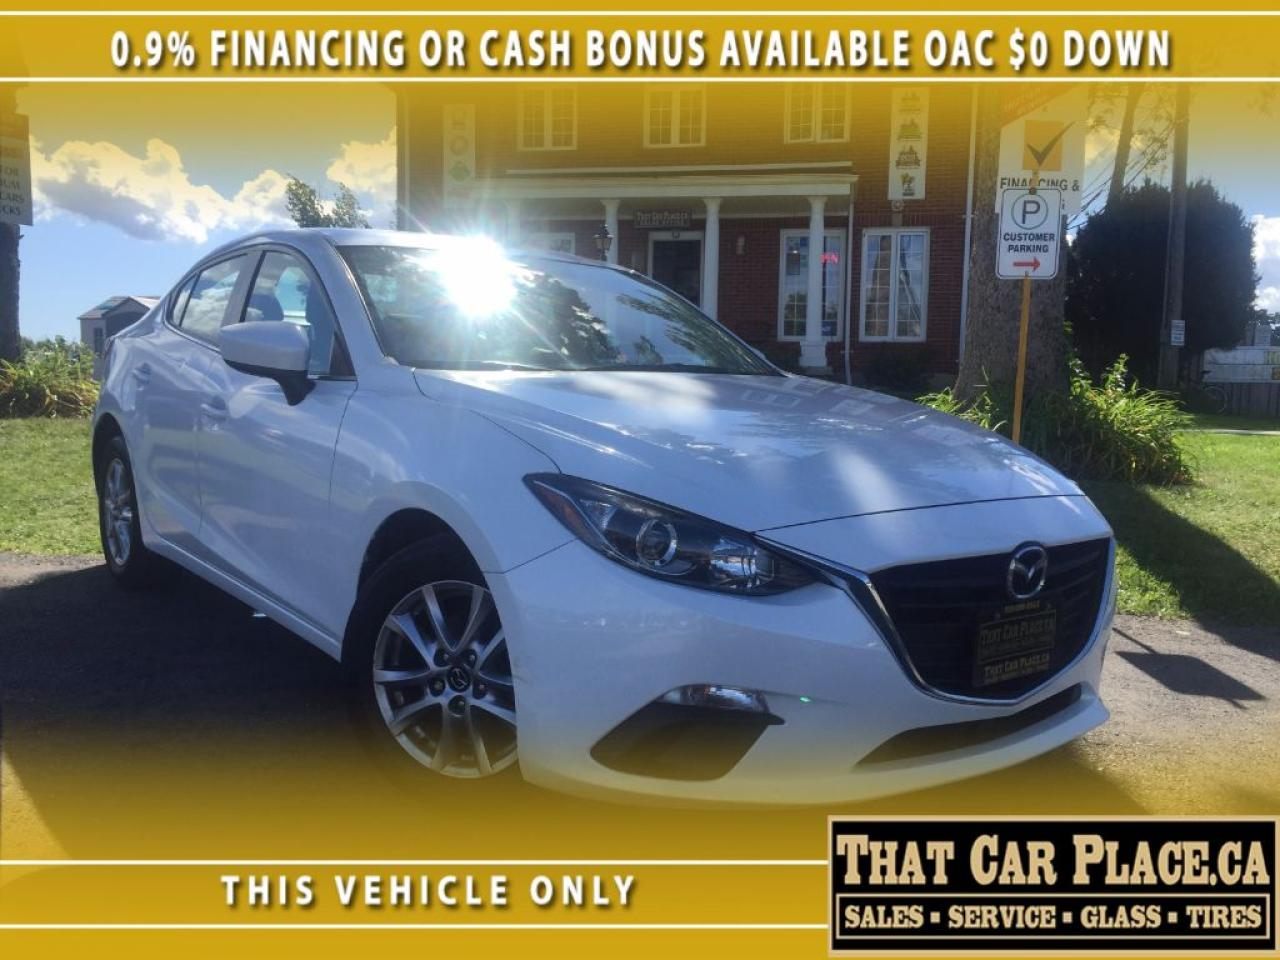 2014 Mazda MAZDA3 GS-0.9%Financing or $1300 CASHBACK-$0DOWN-Loaded